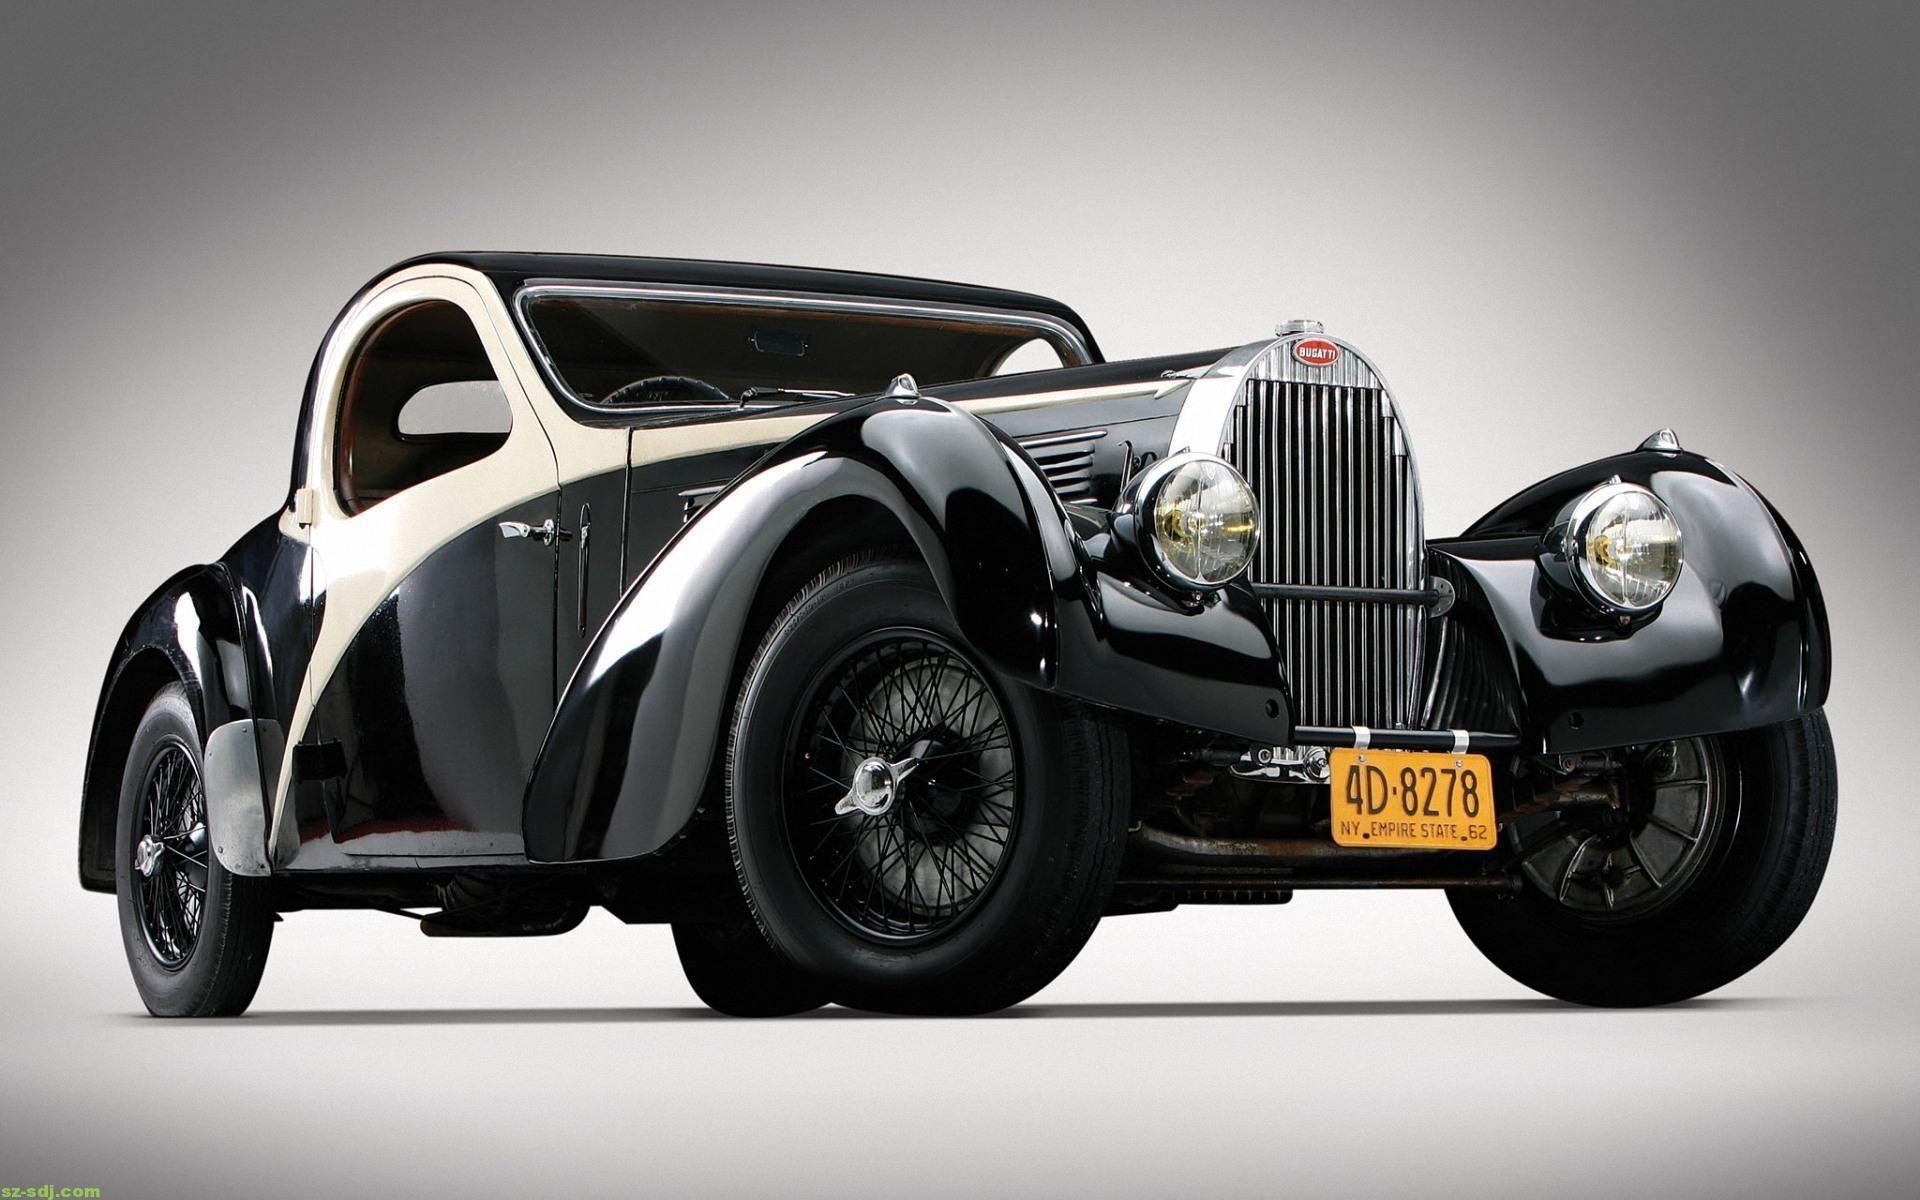 Black Bugatti Type 57 Car Wallpaper Http Car Logos Com Black Bugatti Type 57 Car Wallpaper Antique Cars Bugatti Type 57 Classic Cars